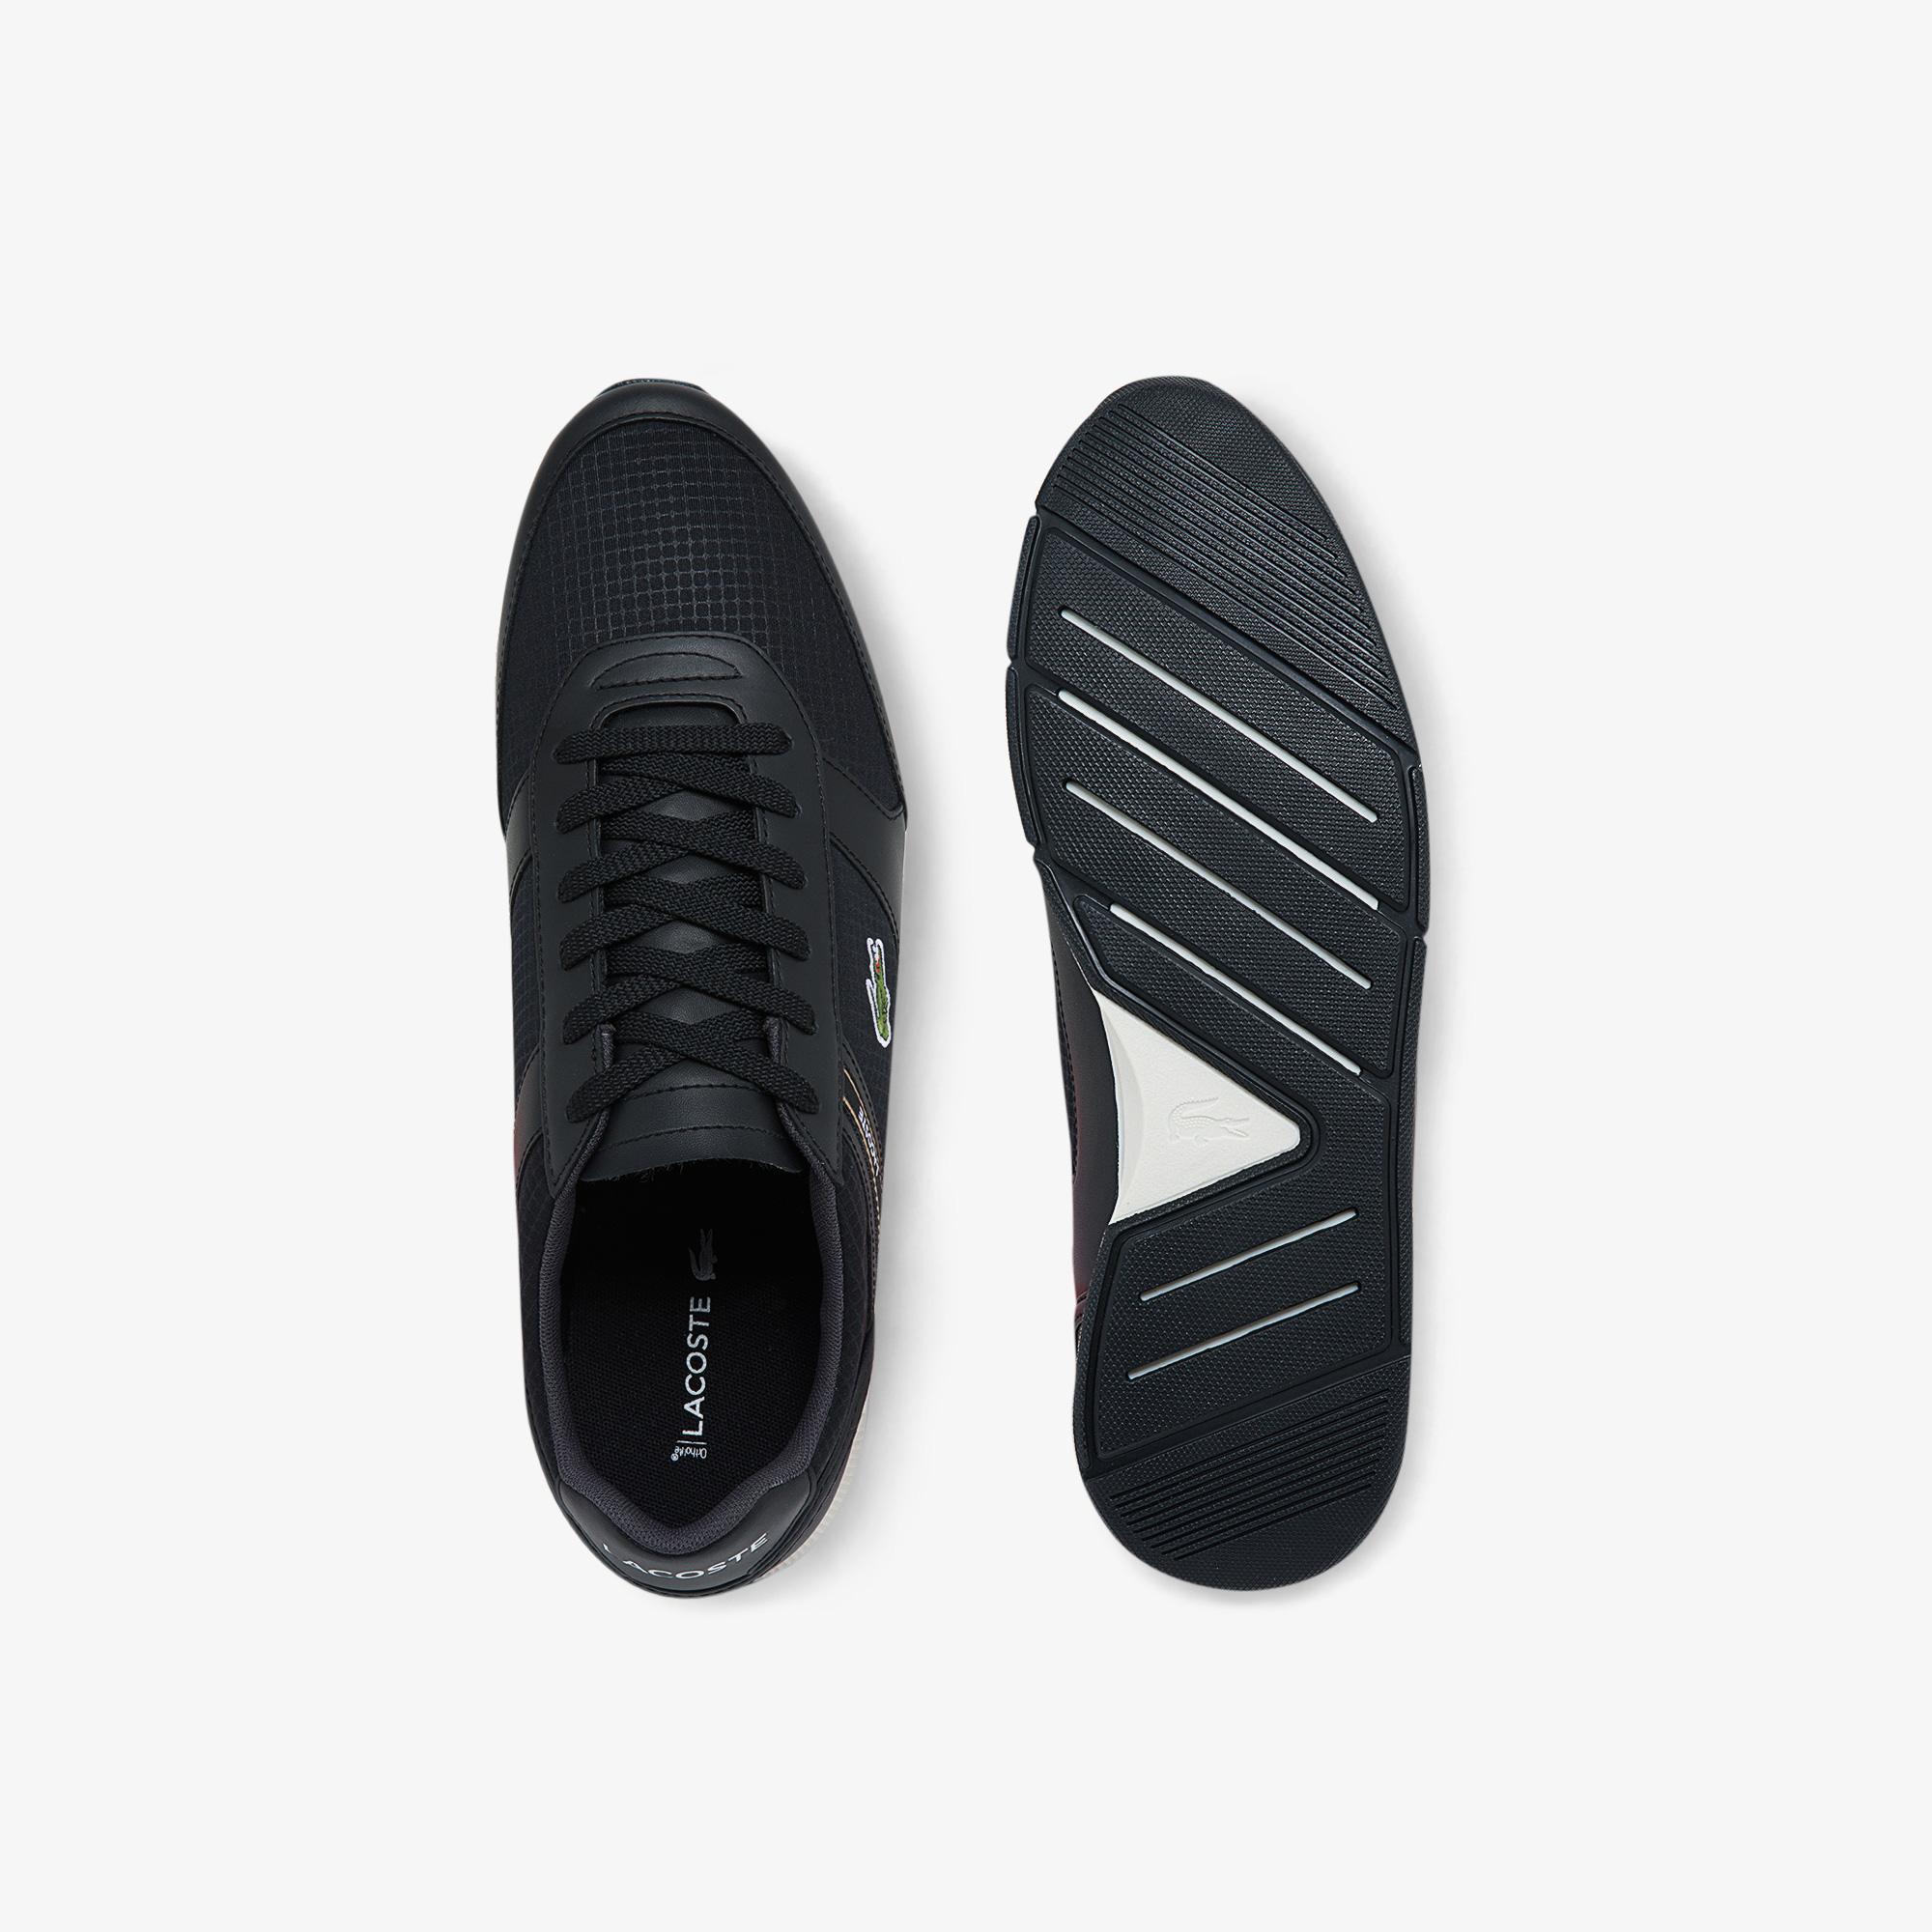 Lacoste Menerva Sport 0121 1 Cma Erkek Siyah - Beyaz Sneaker